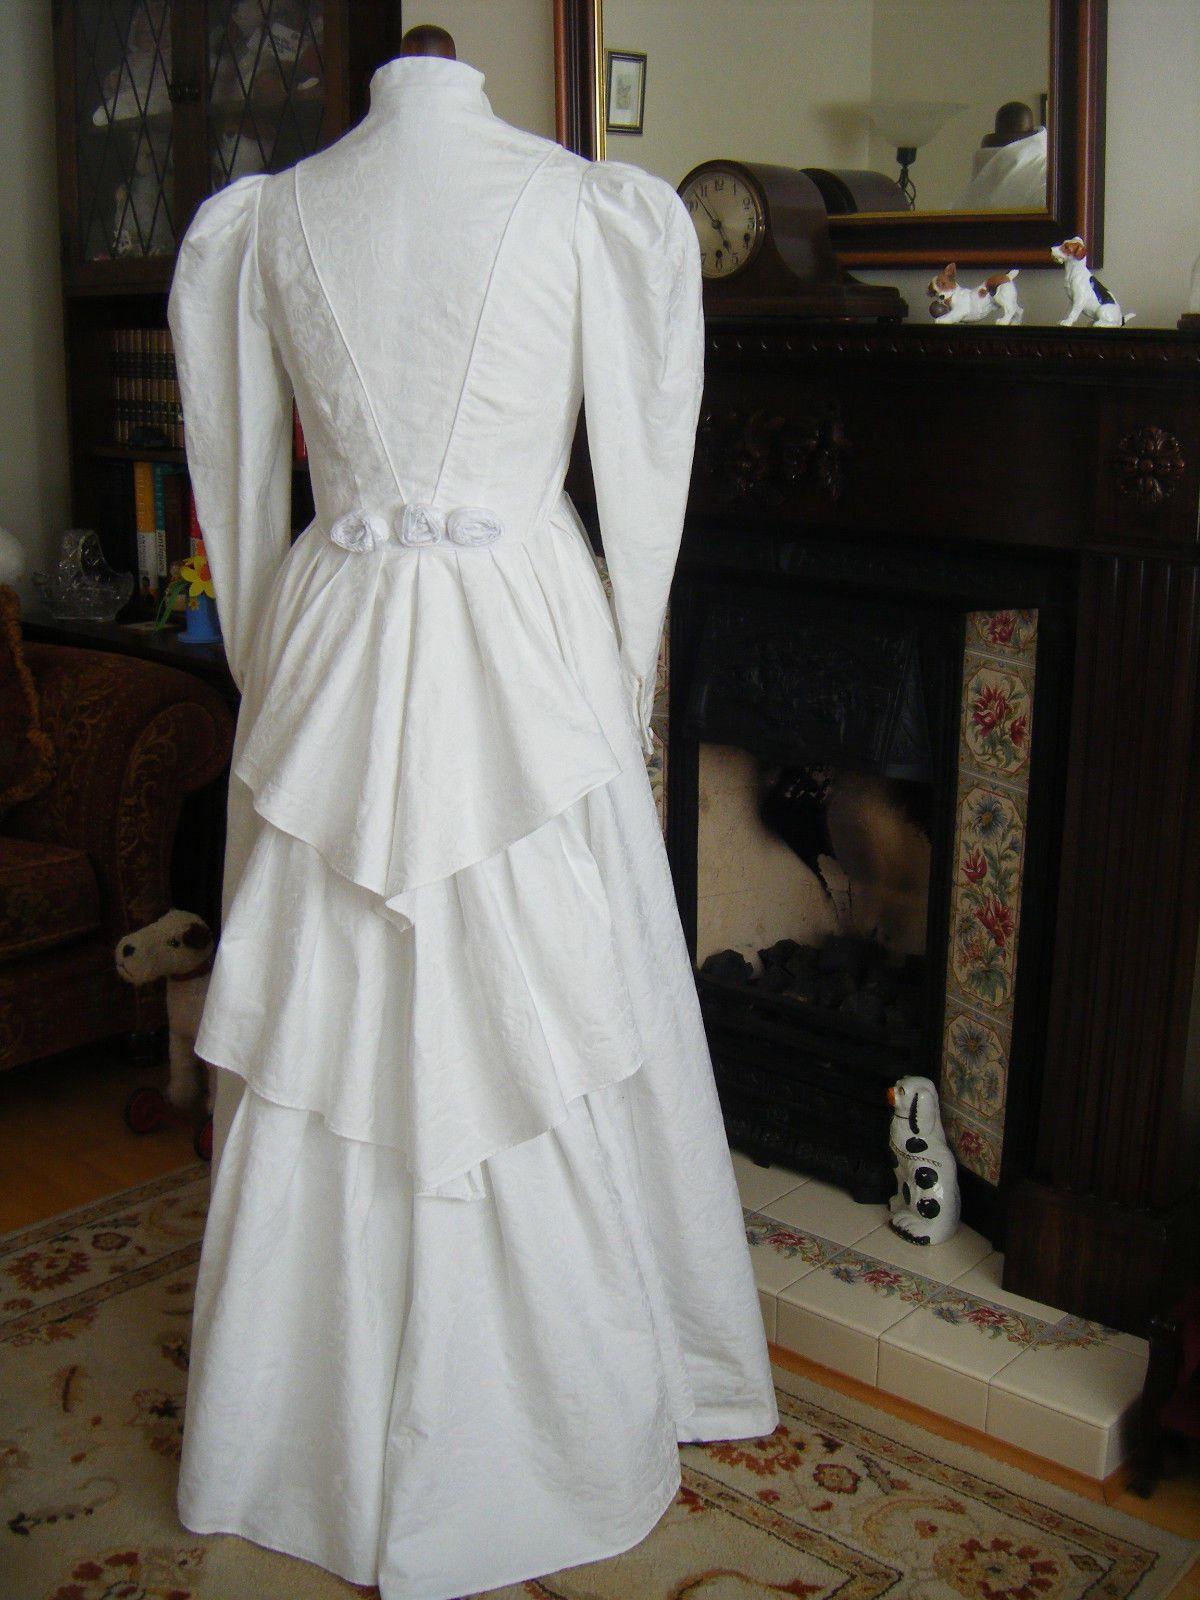 LAURA ASHLEY VINTAGE 1980s' VICTORIAN WEDDING DRESS FINAL